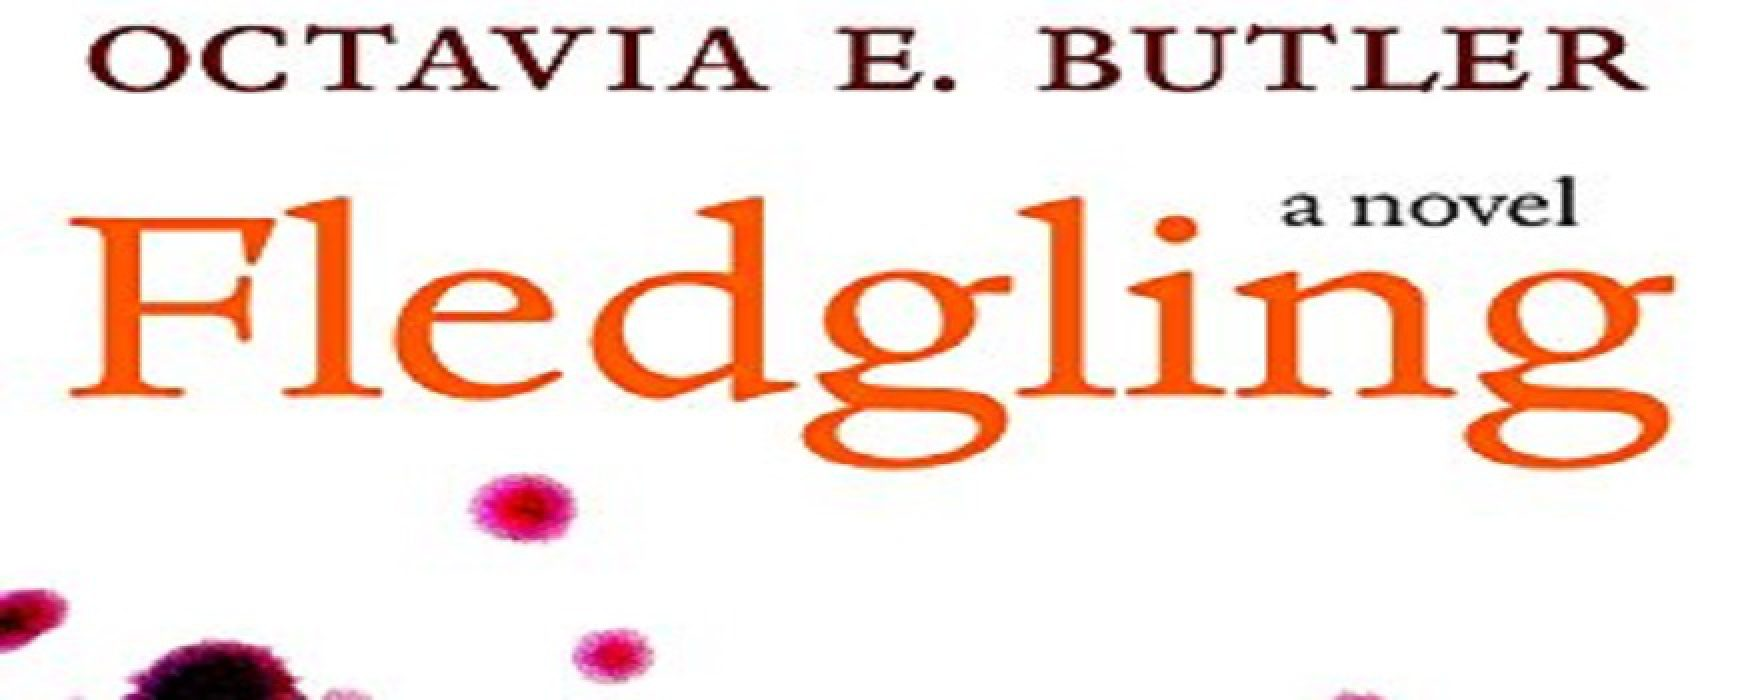 Fledgling: A Look Back at Octavia Butler